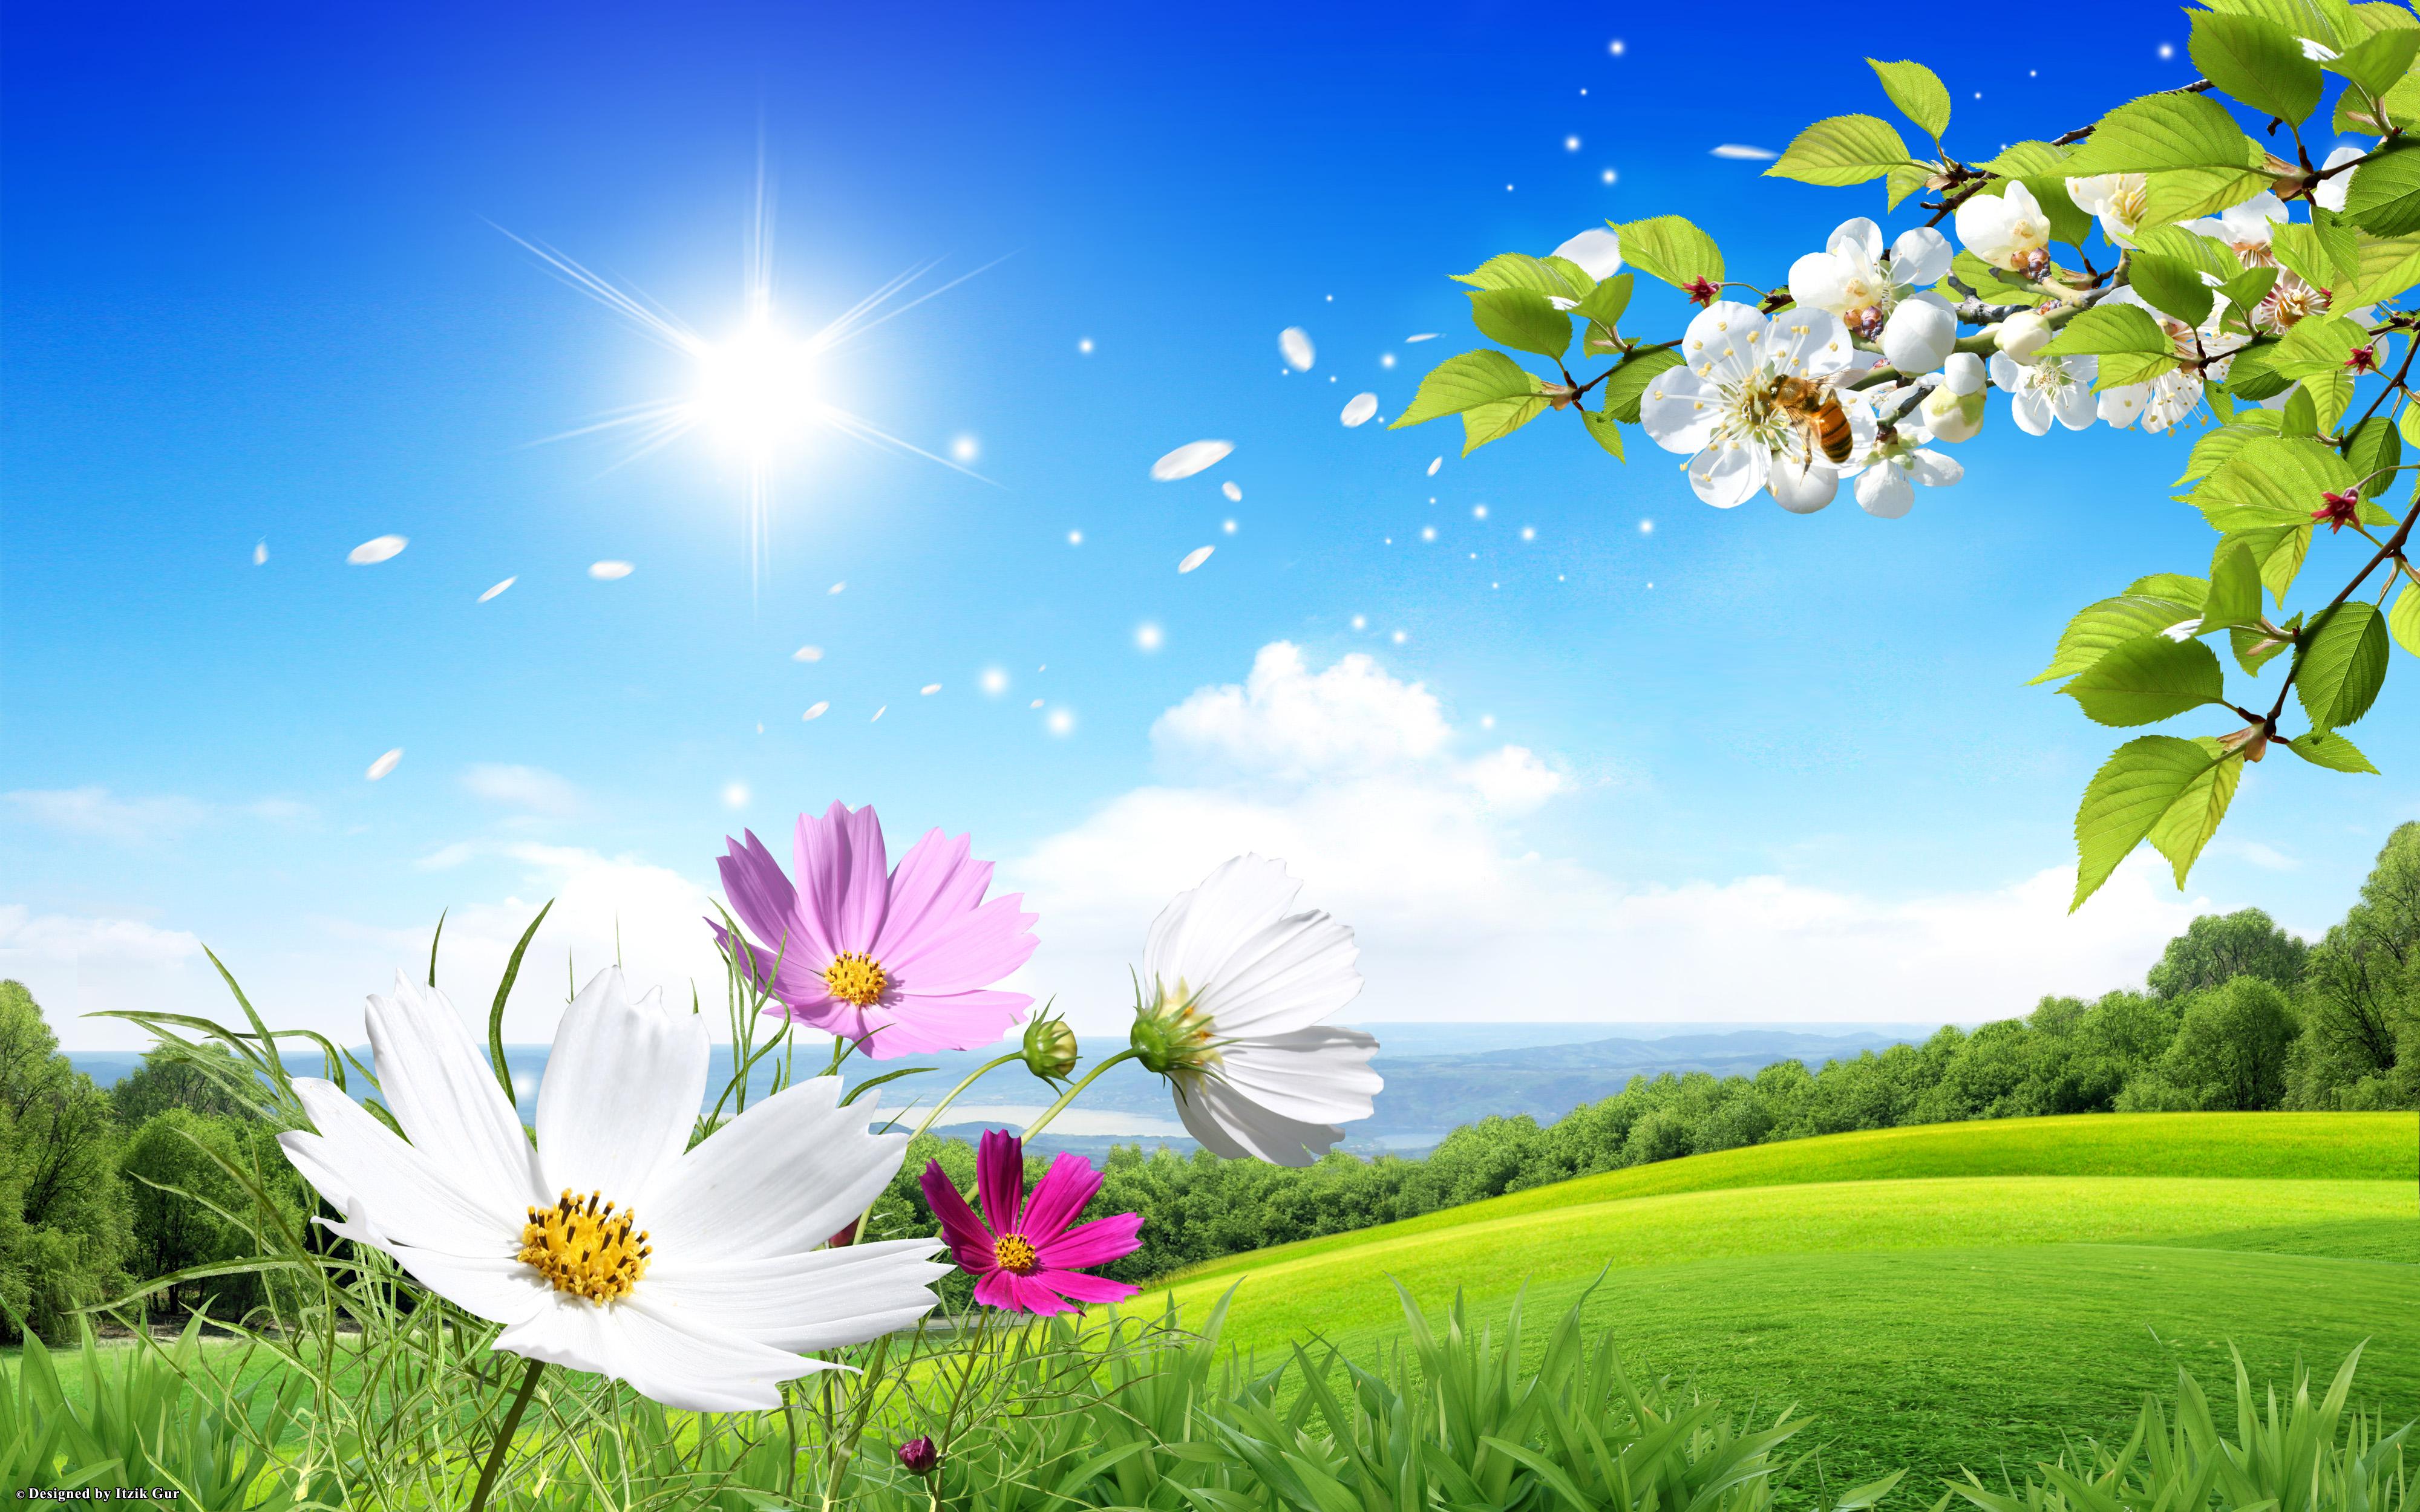 Spring Cute Nature Wallpaper HD 5756 Wallpaper Download HD 4000x2500